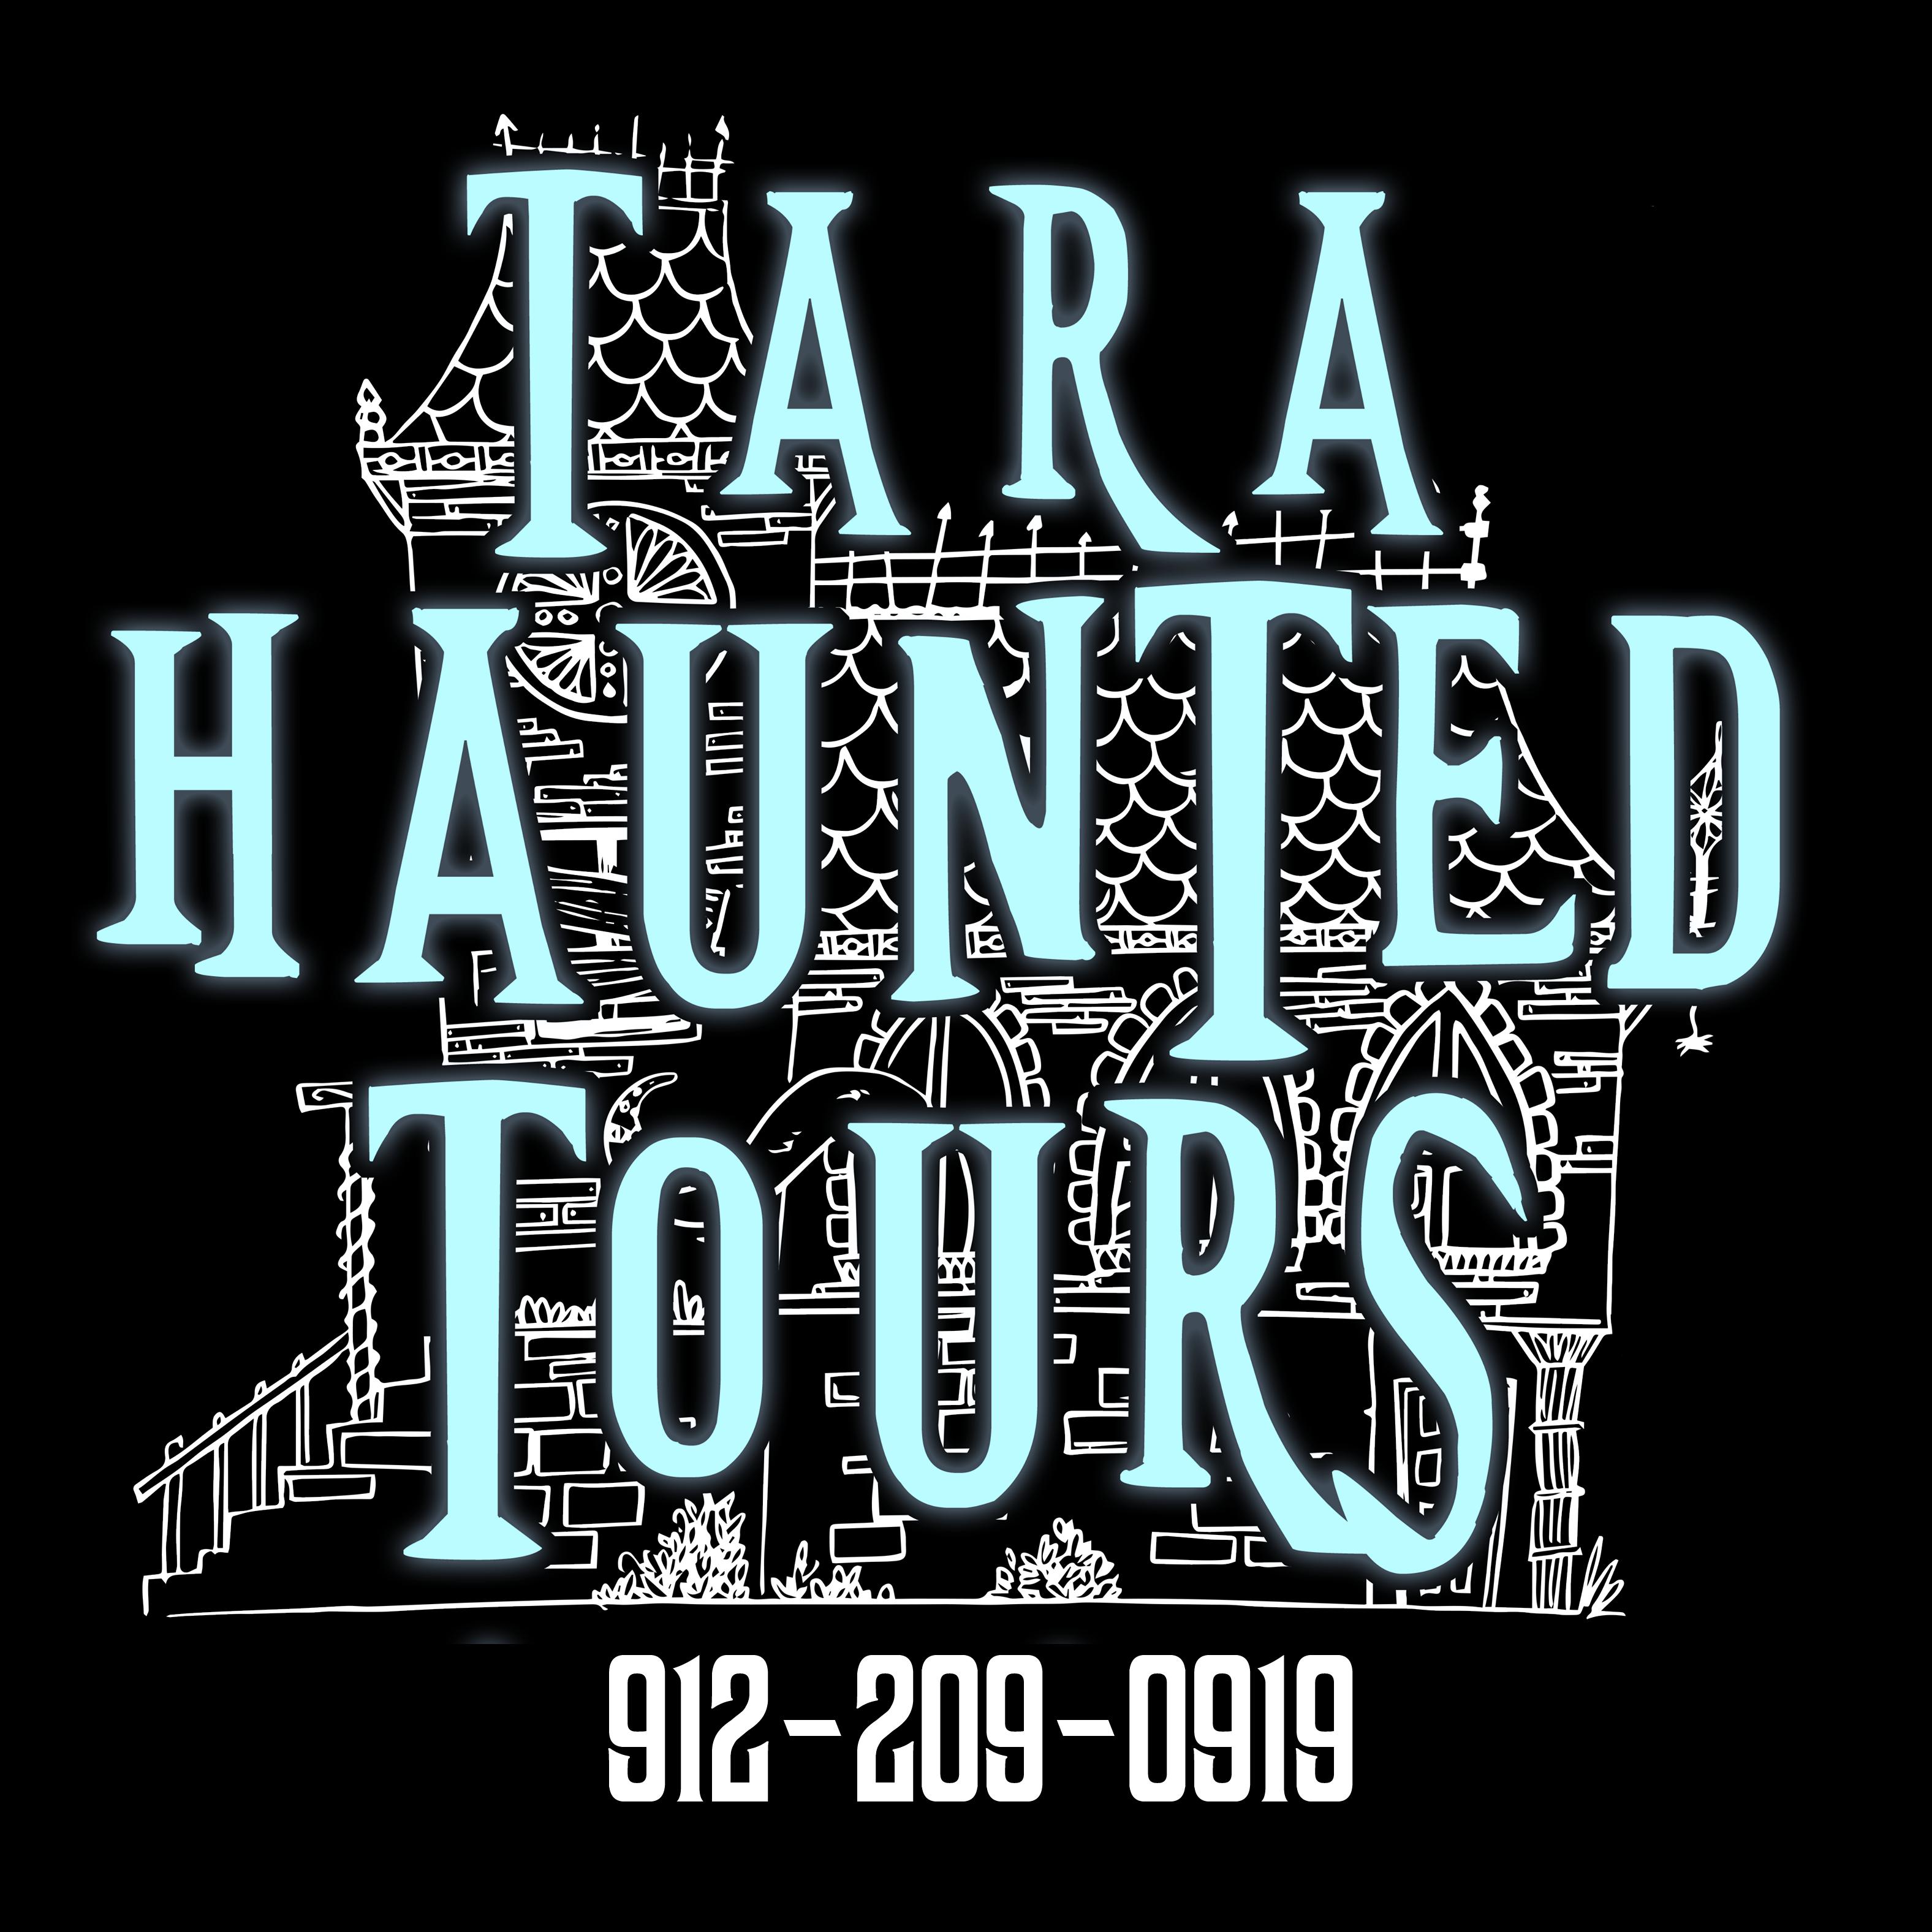 Tara Haunted Tours image 16